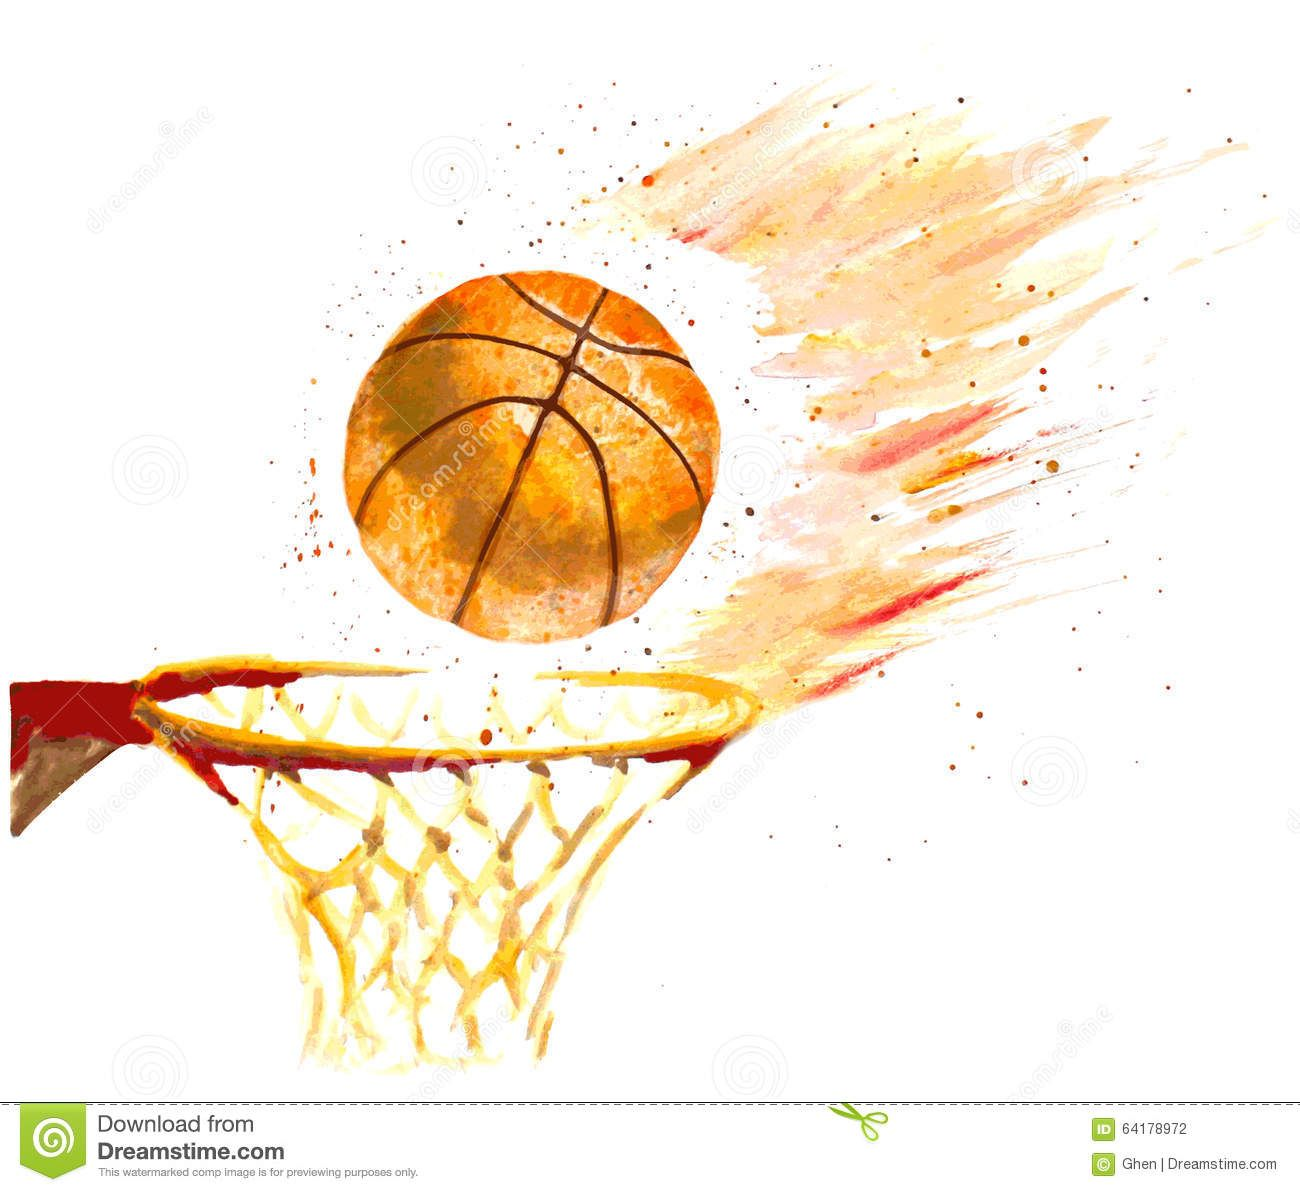 watercolor elephant basketball - Google Search | painting ideas | Pinterest | Watercolor, Google ...